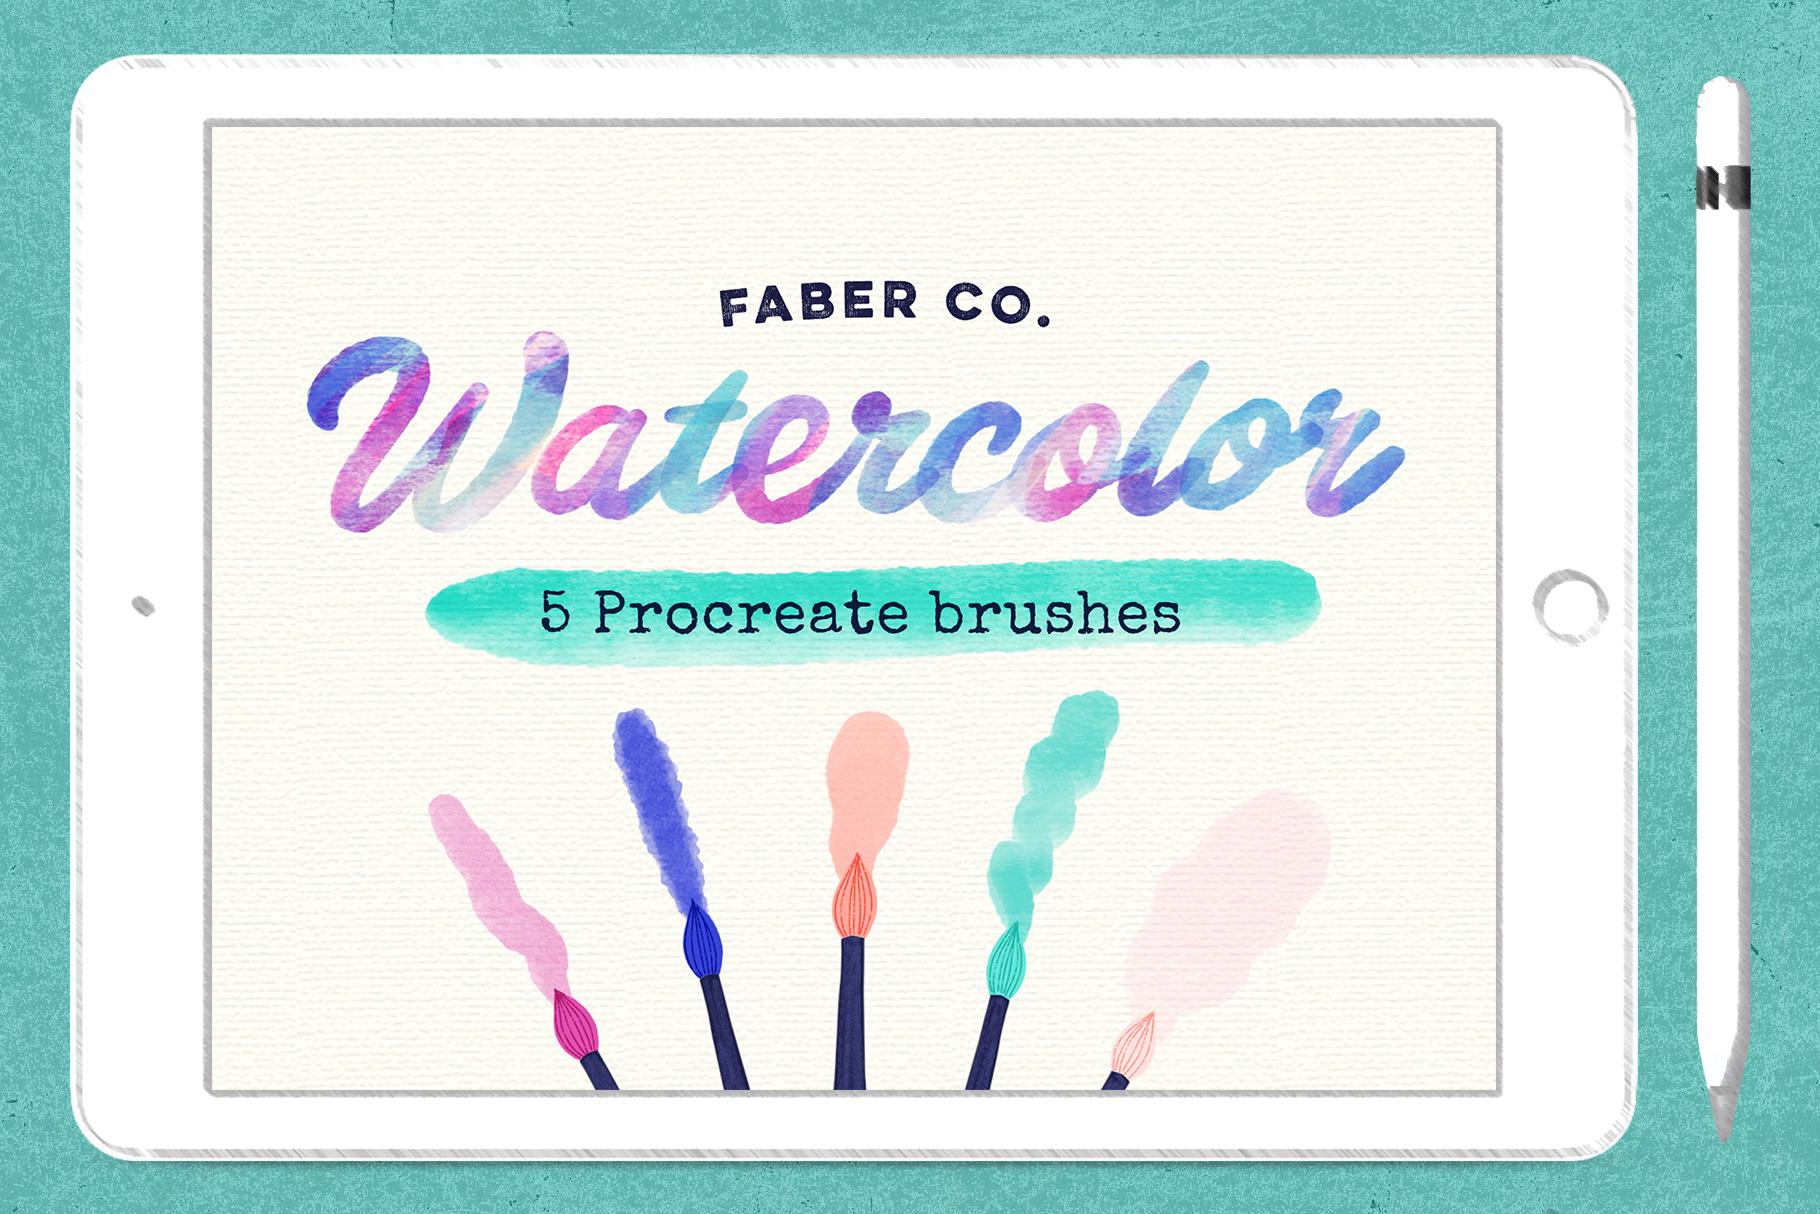 Watercolor_FaberCo_Ipad_Cover-Image_MOCKUP_Pencil.jpg